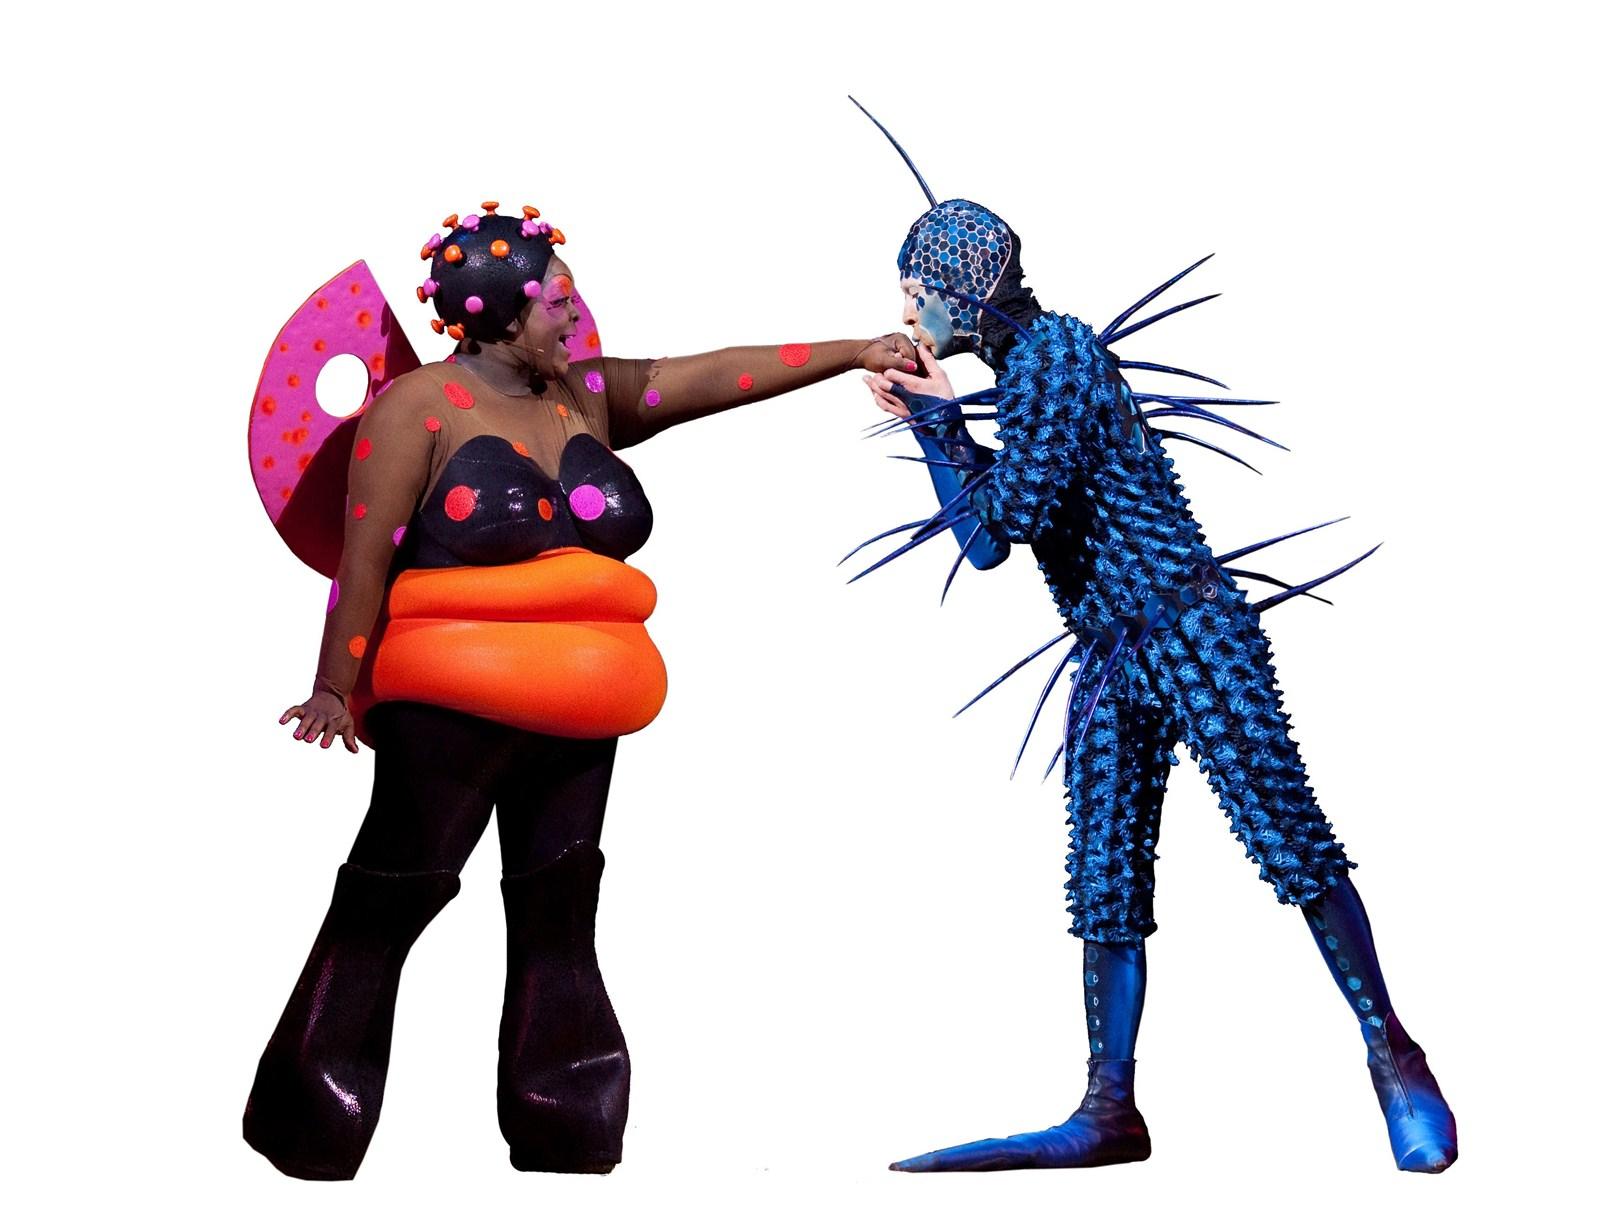 CIRQUE du Soleilu0027s buggy comic relief in u201cOvo.u201d (Cirque du Soleil )  sc 1 st  Hartford Courant & Cirque Du Soleilu0027s u0027Ovou0027 Dazzles - Hartford Courant